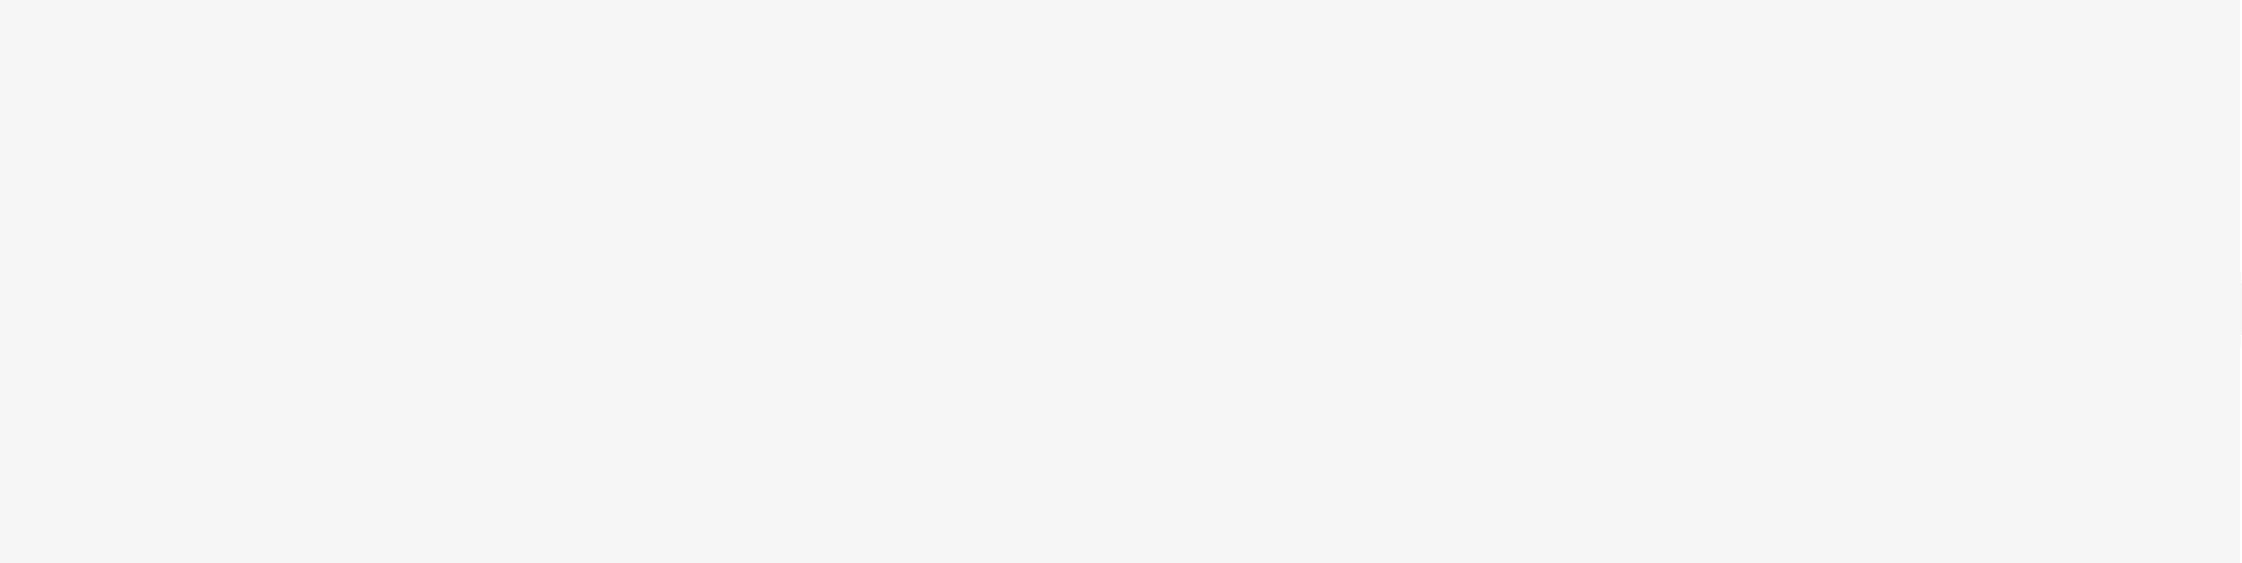 fyzio-napis-grey-cut